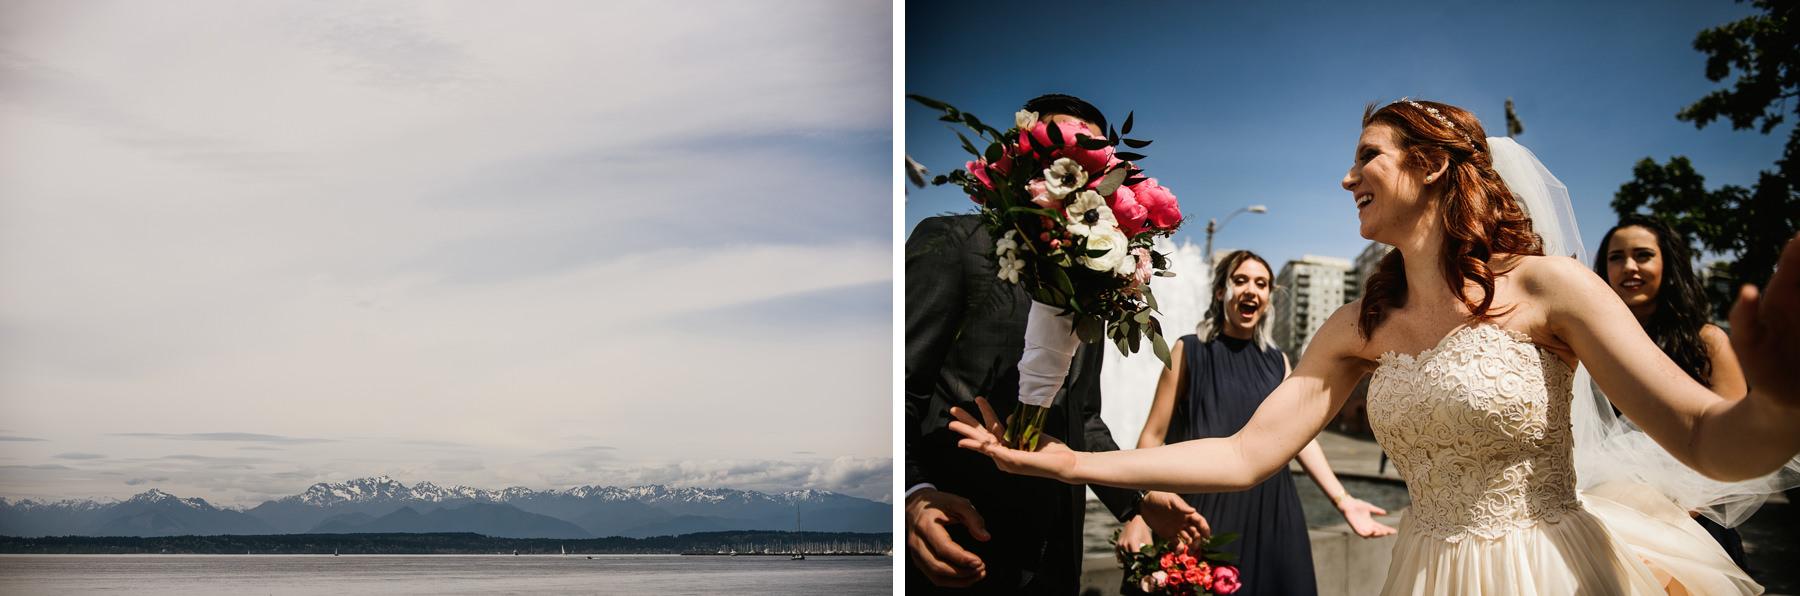 arctic-club-wedding-seattle-photographer-36